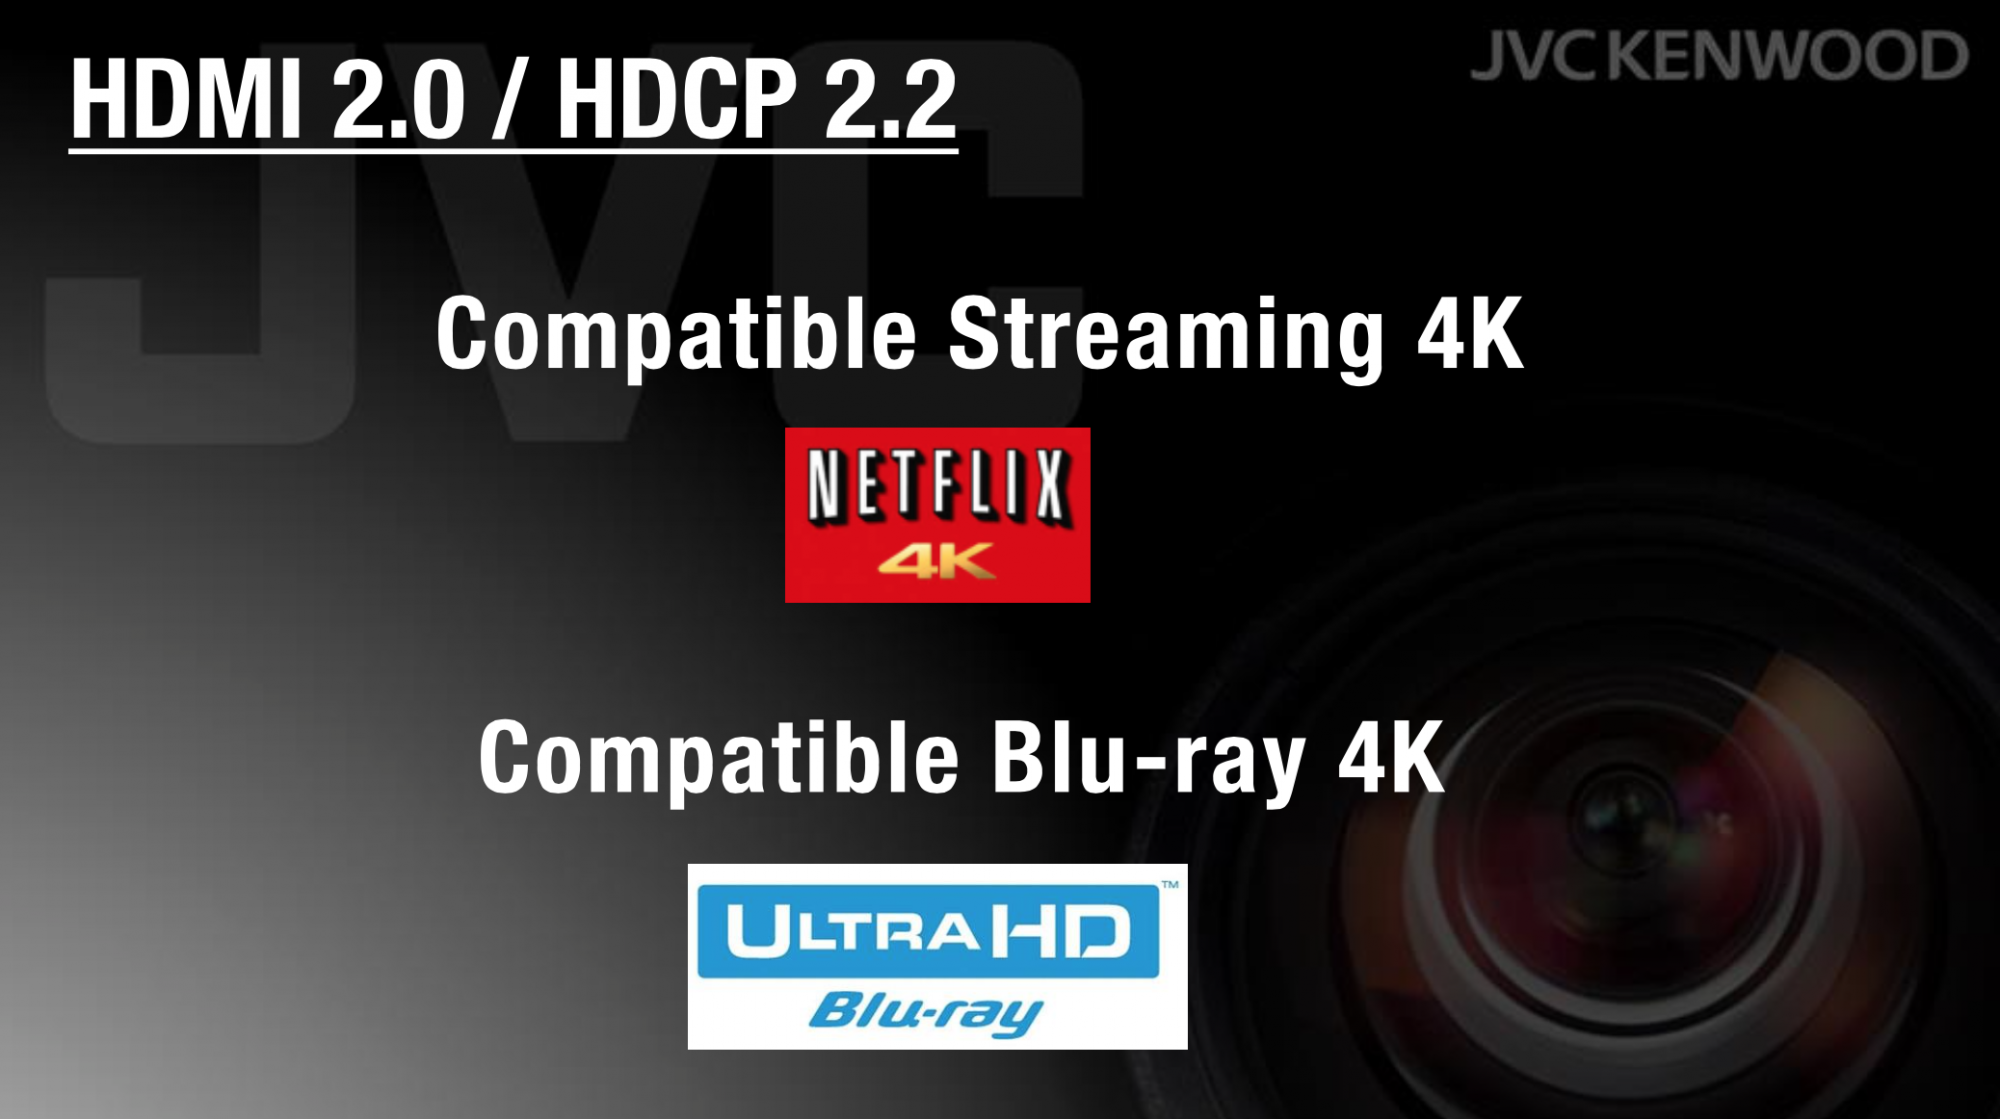 HDMI 2.0 HDCP 2.2 JVC DLA-X7000